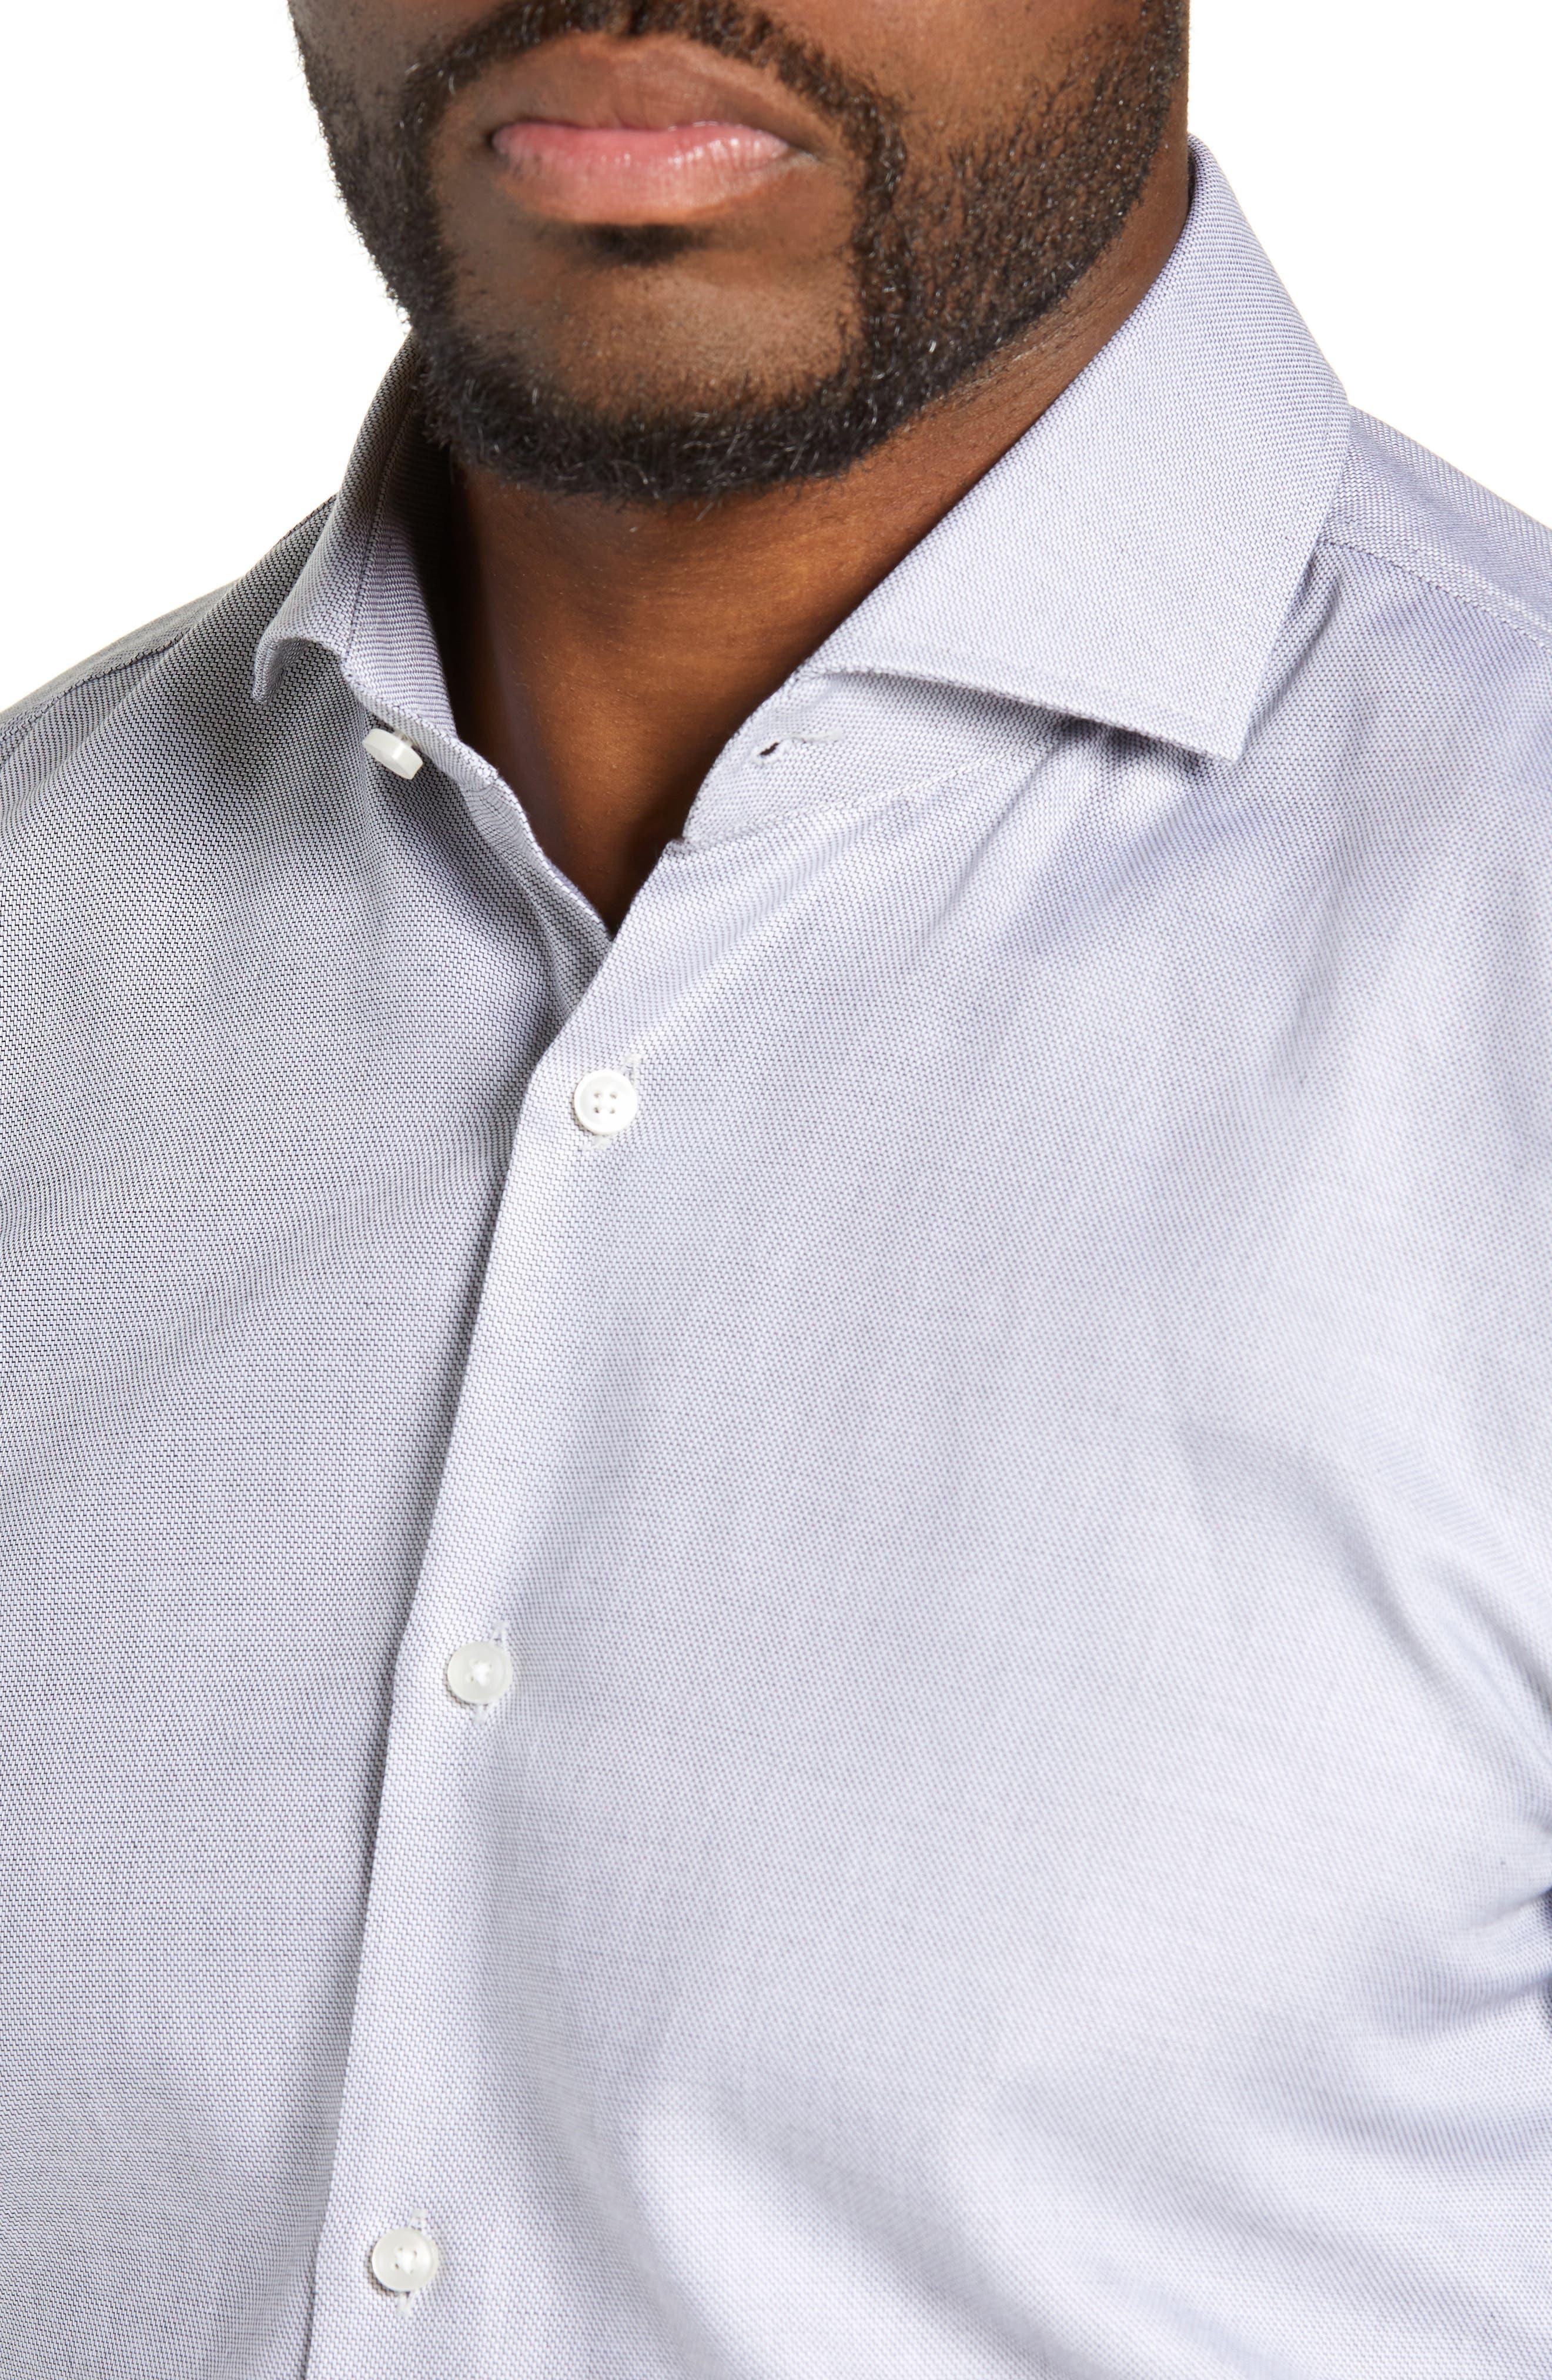 Jason Trim Fit Solid Dress Shirt,                             Alternate thumbnail 2, color,                             BLACK